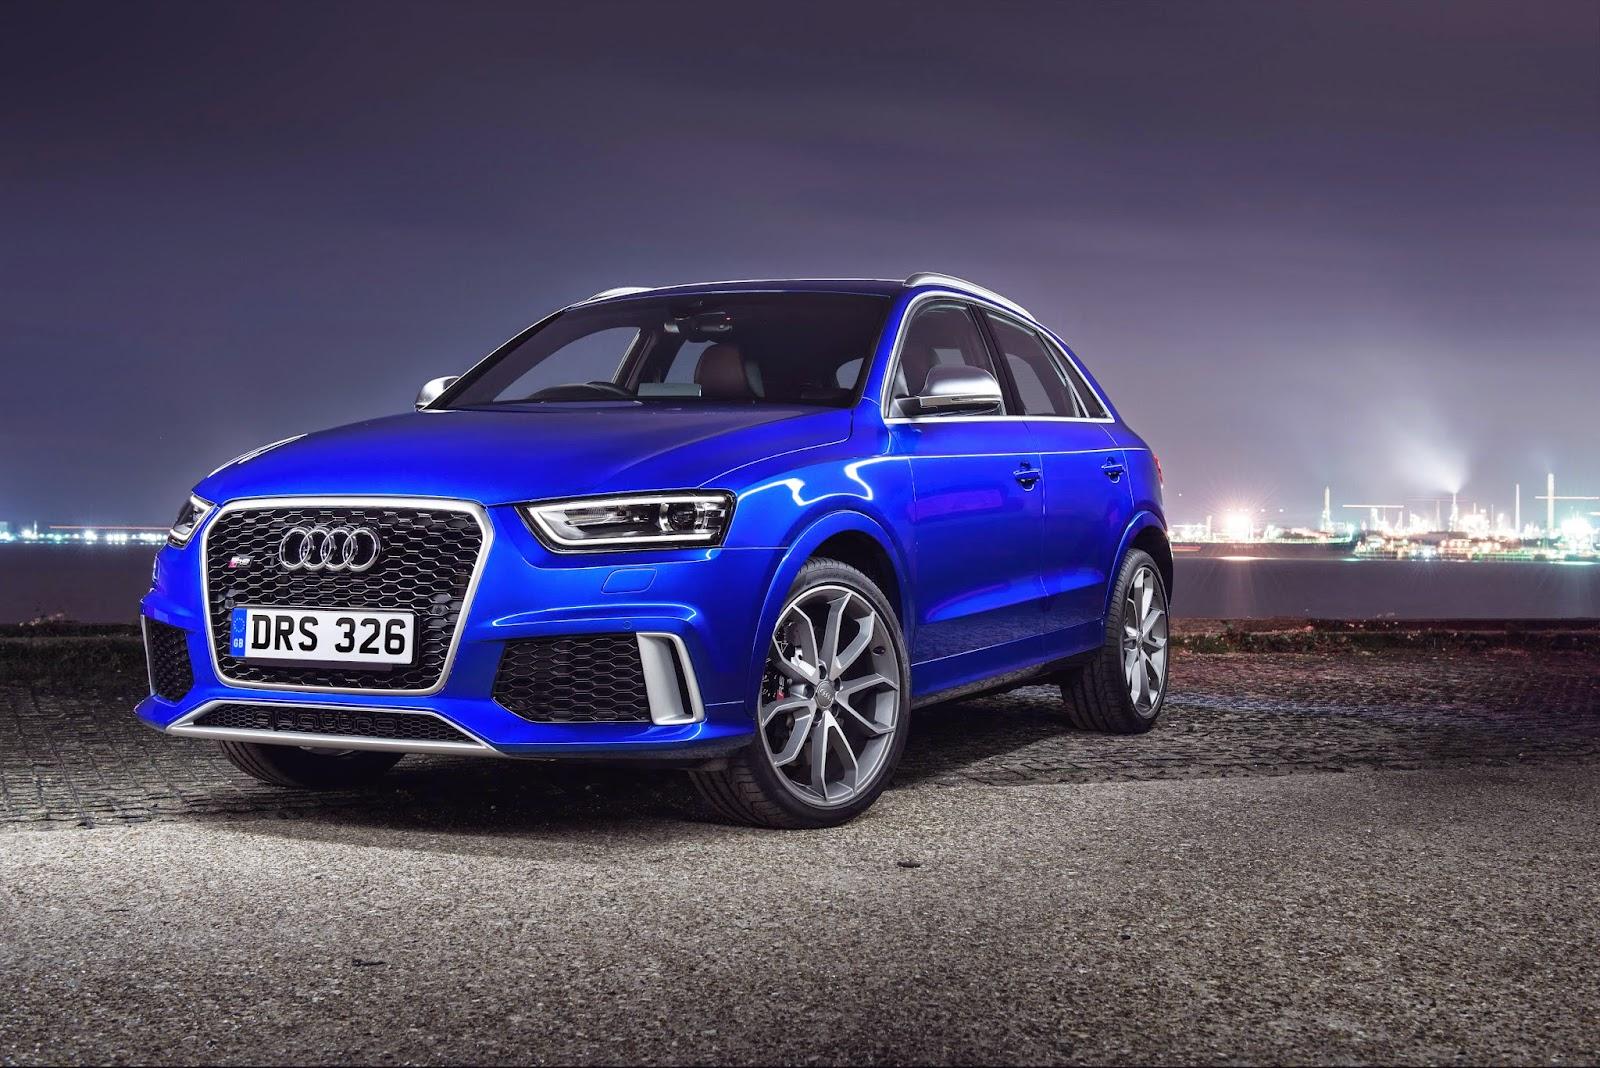 Blue Audi RSQ3